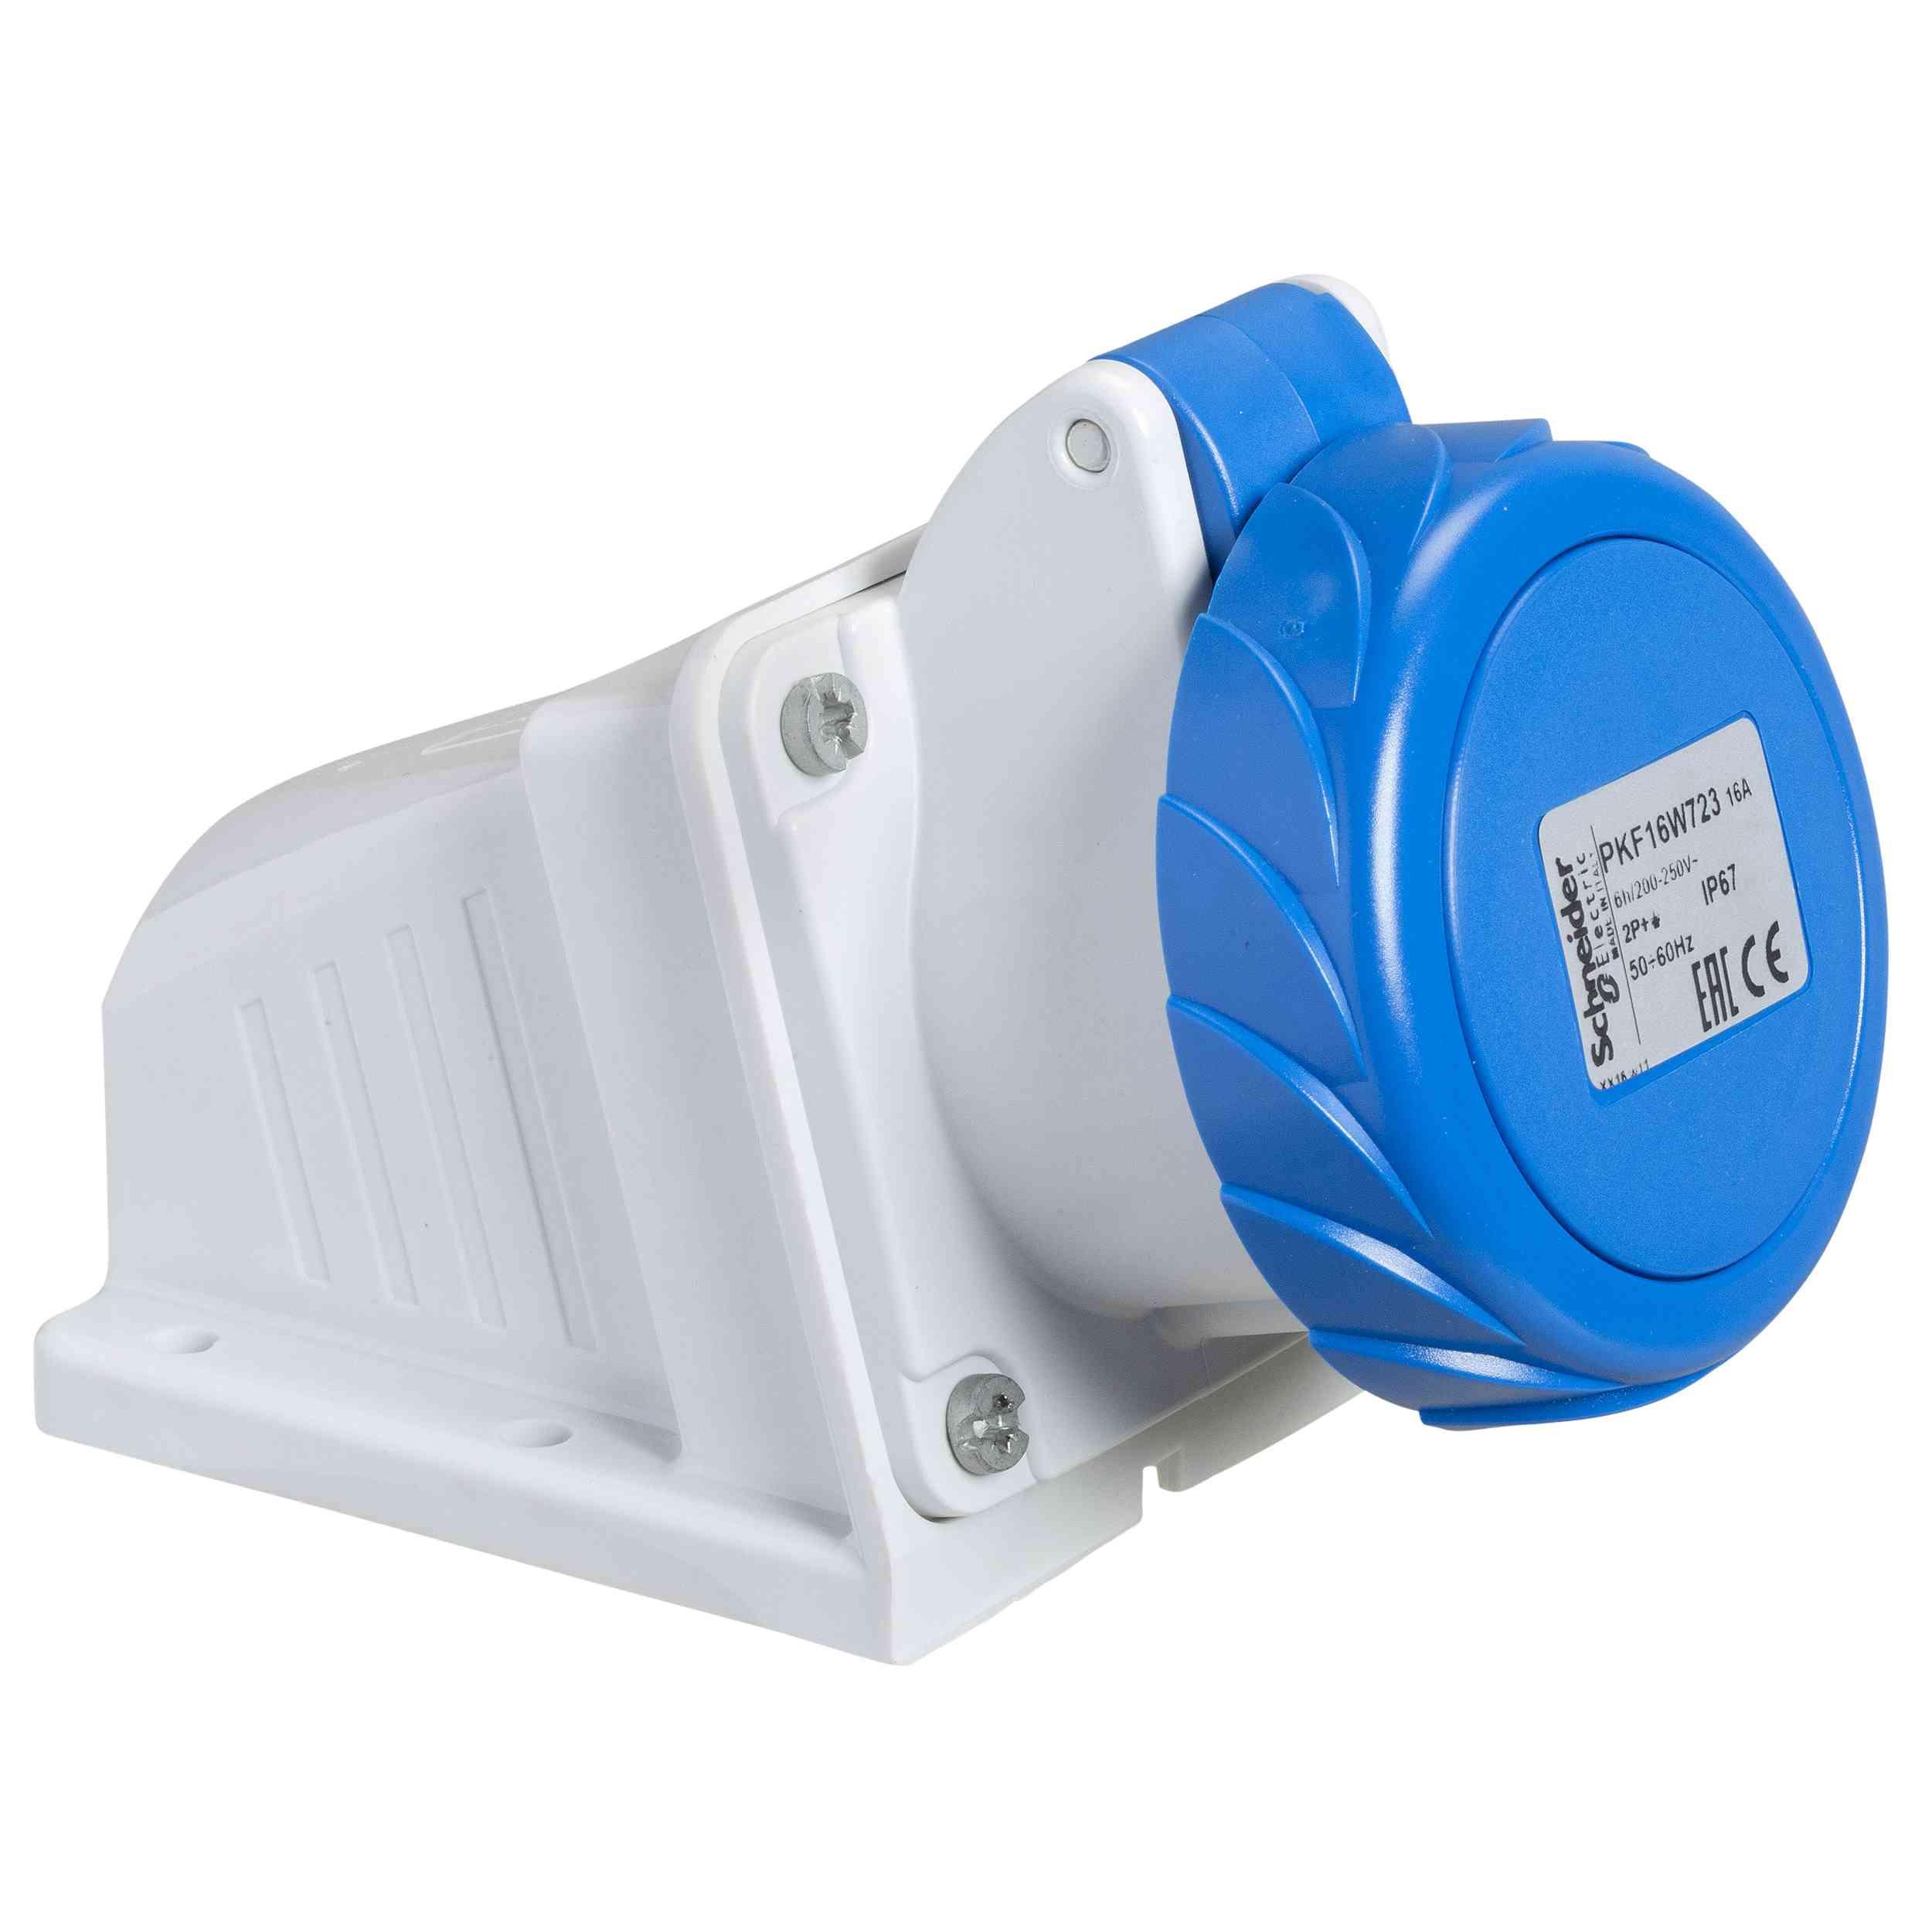 Vtičnica PratiKa - vijak - kotna - 16 A - 2P + E - 200 do 250 V AC - stena